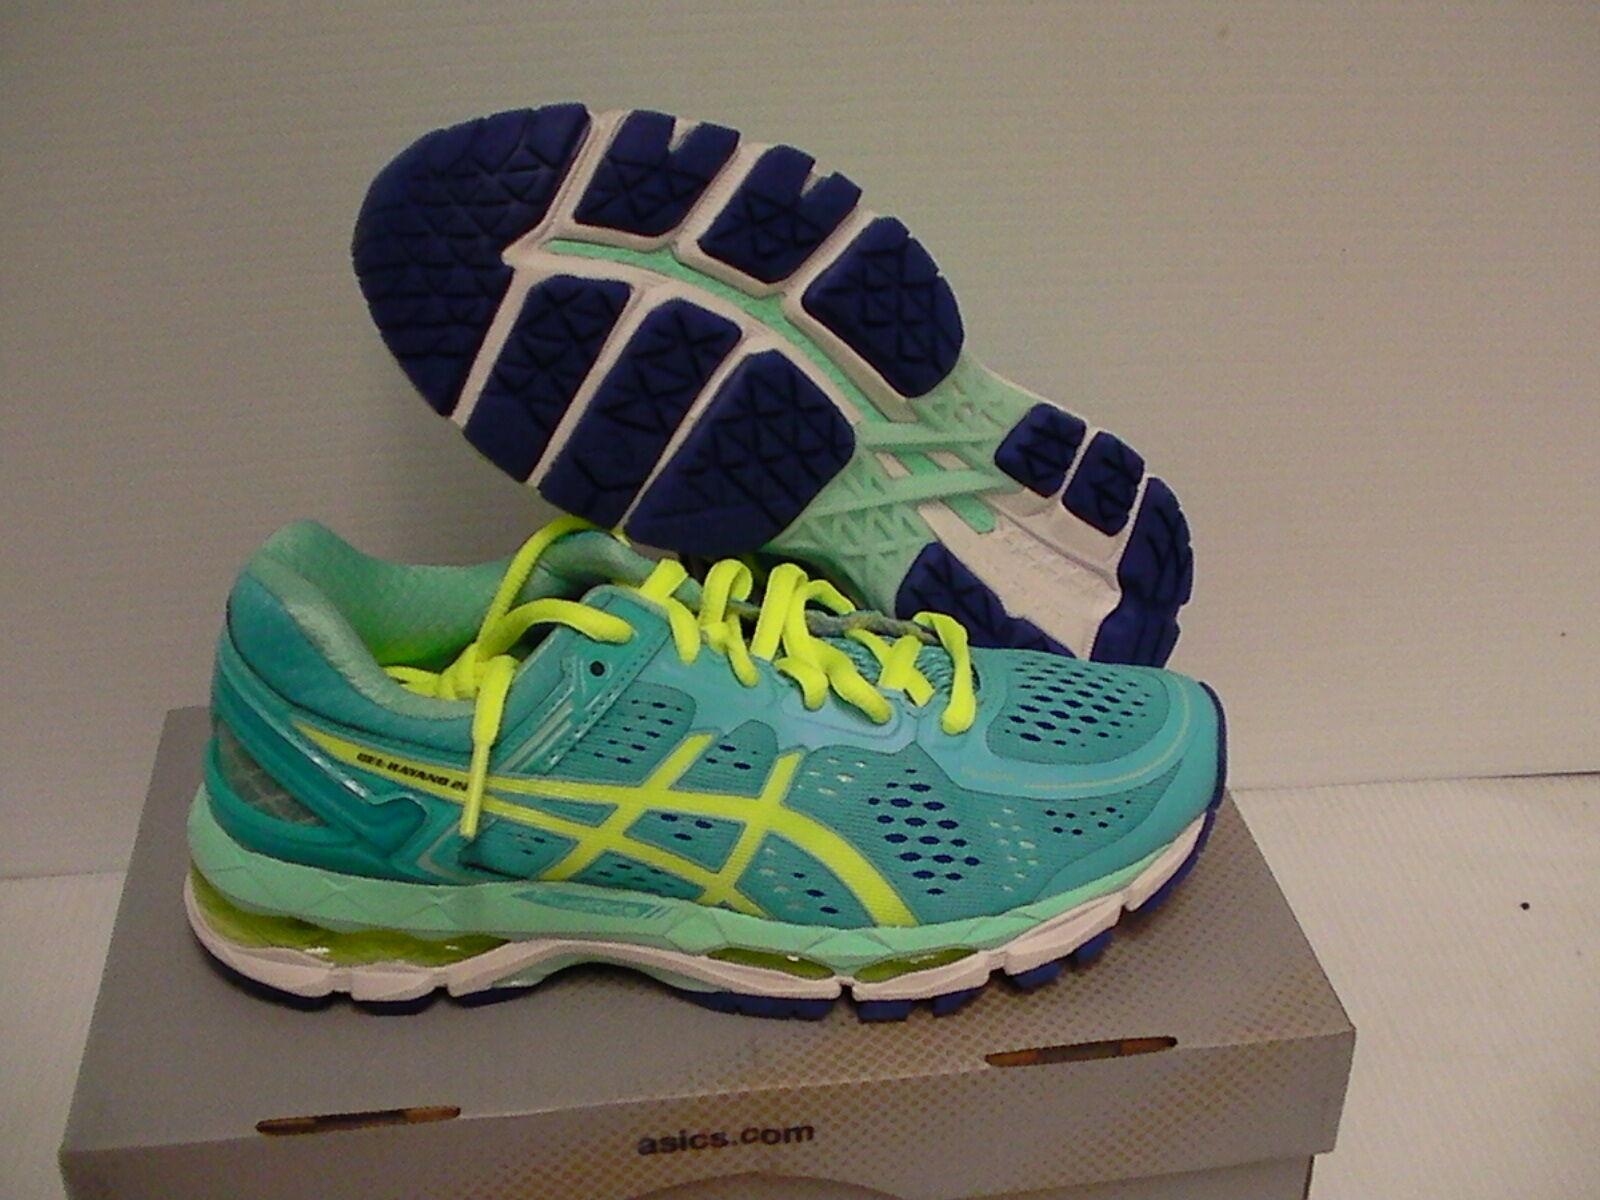 Asics women's running shoes gel kayano 22 ice blue flash blue size 6.5 Brand discount